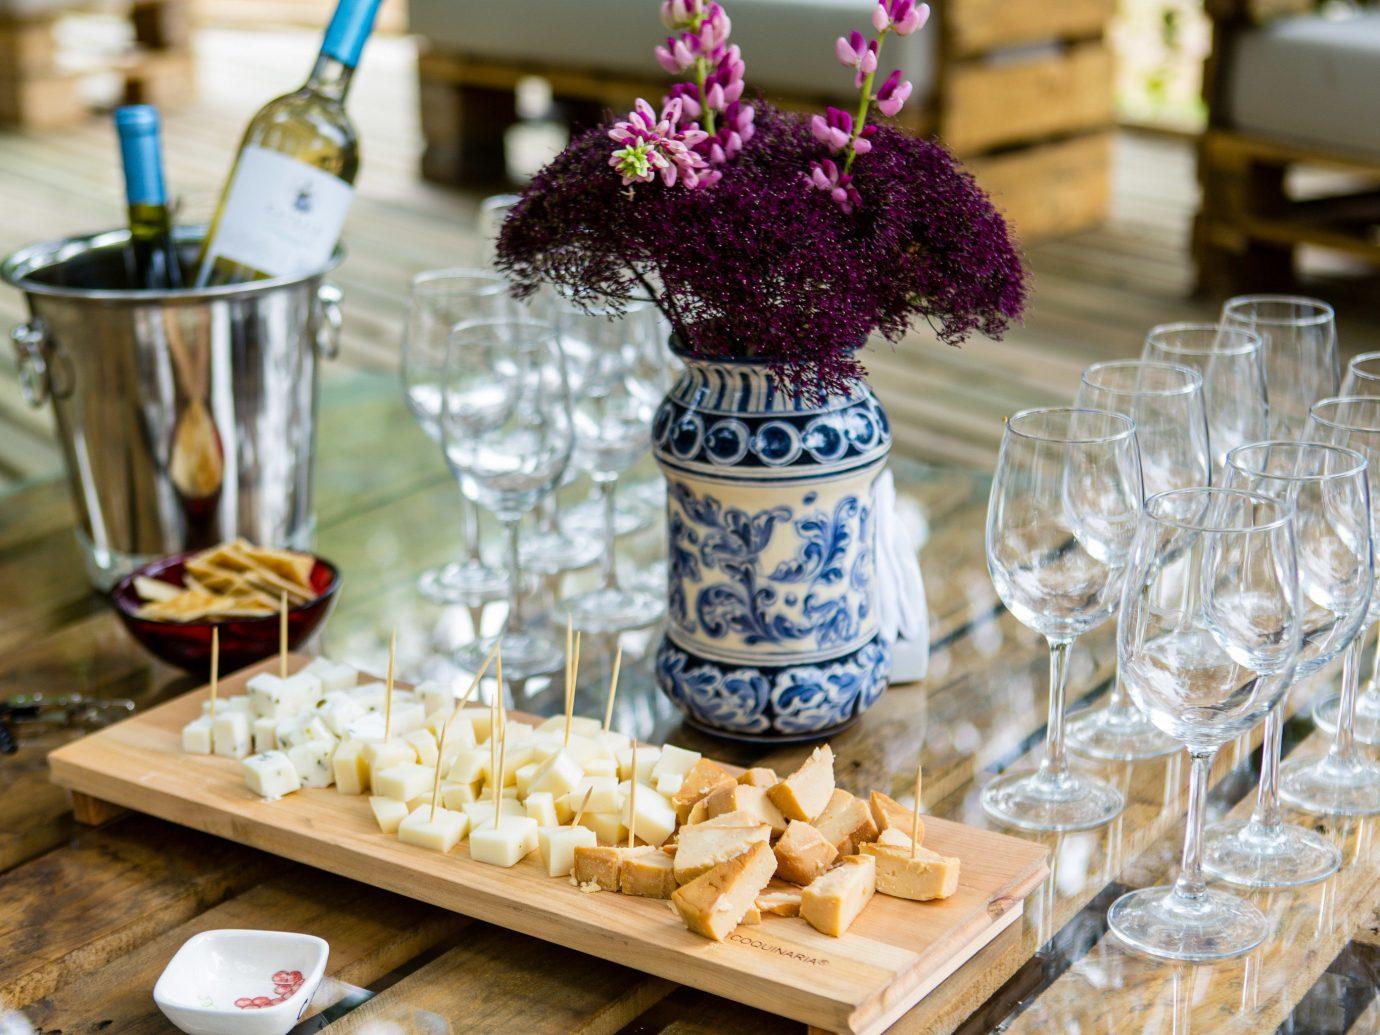 table food brunch tableware finger food centrepiece flavor snack drinkware several dining table